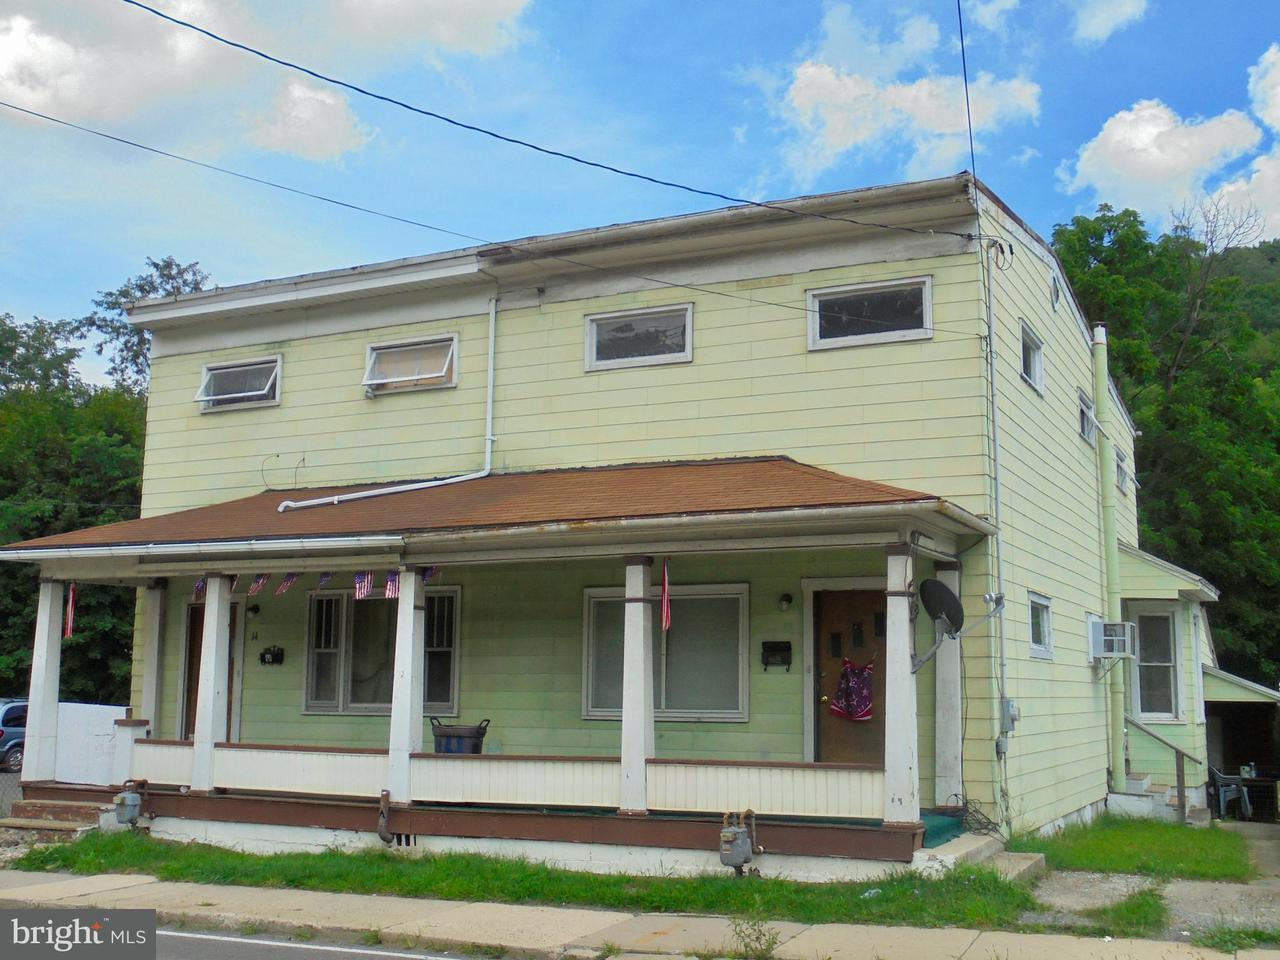 Single Family for Sale at 12 Main St Lonaconing, Maryland 21539 United States